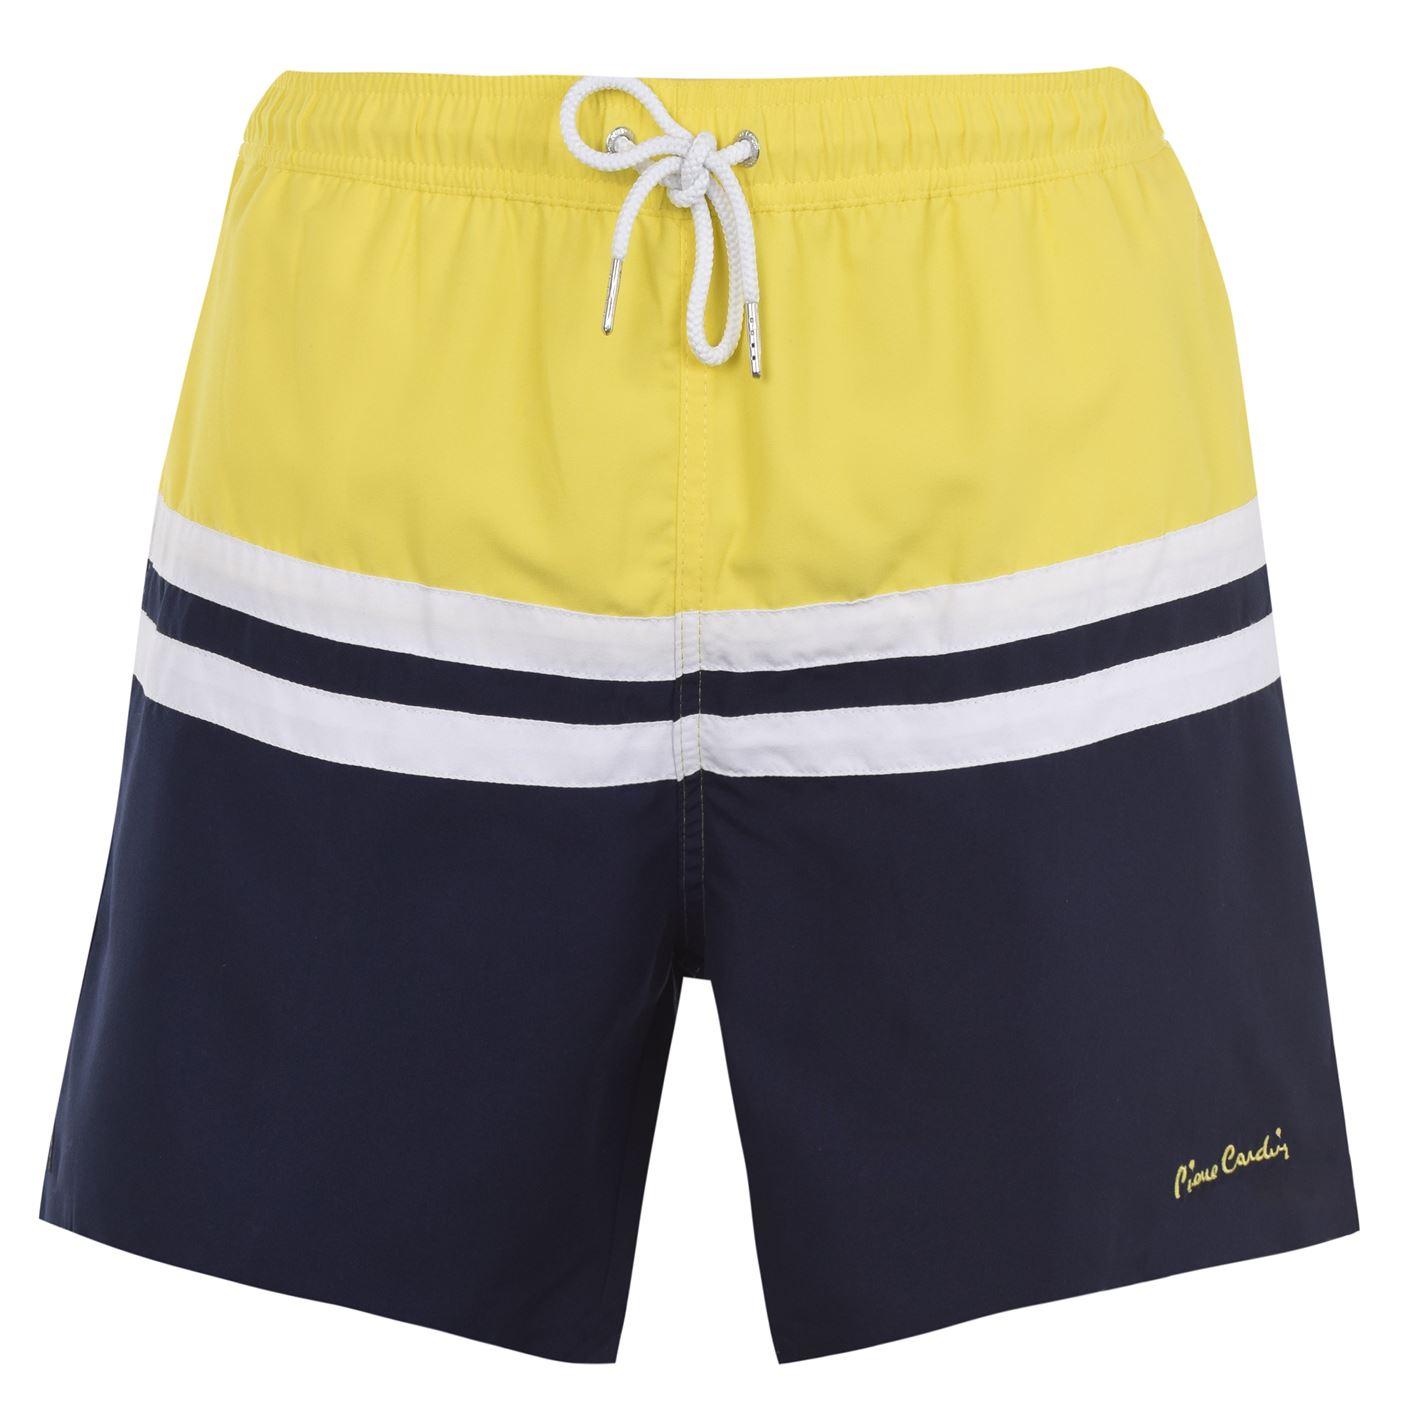 Mergi la Pantaloni scurti inot Pierre Cardin pentru Barbati galben bleumarin